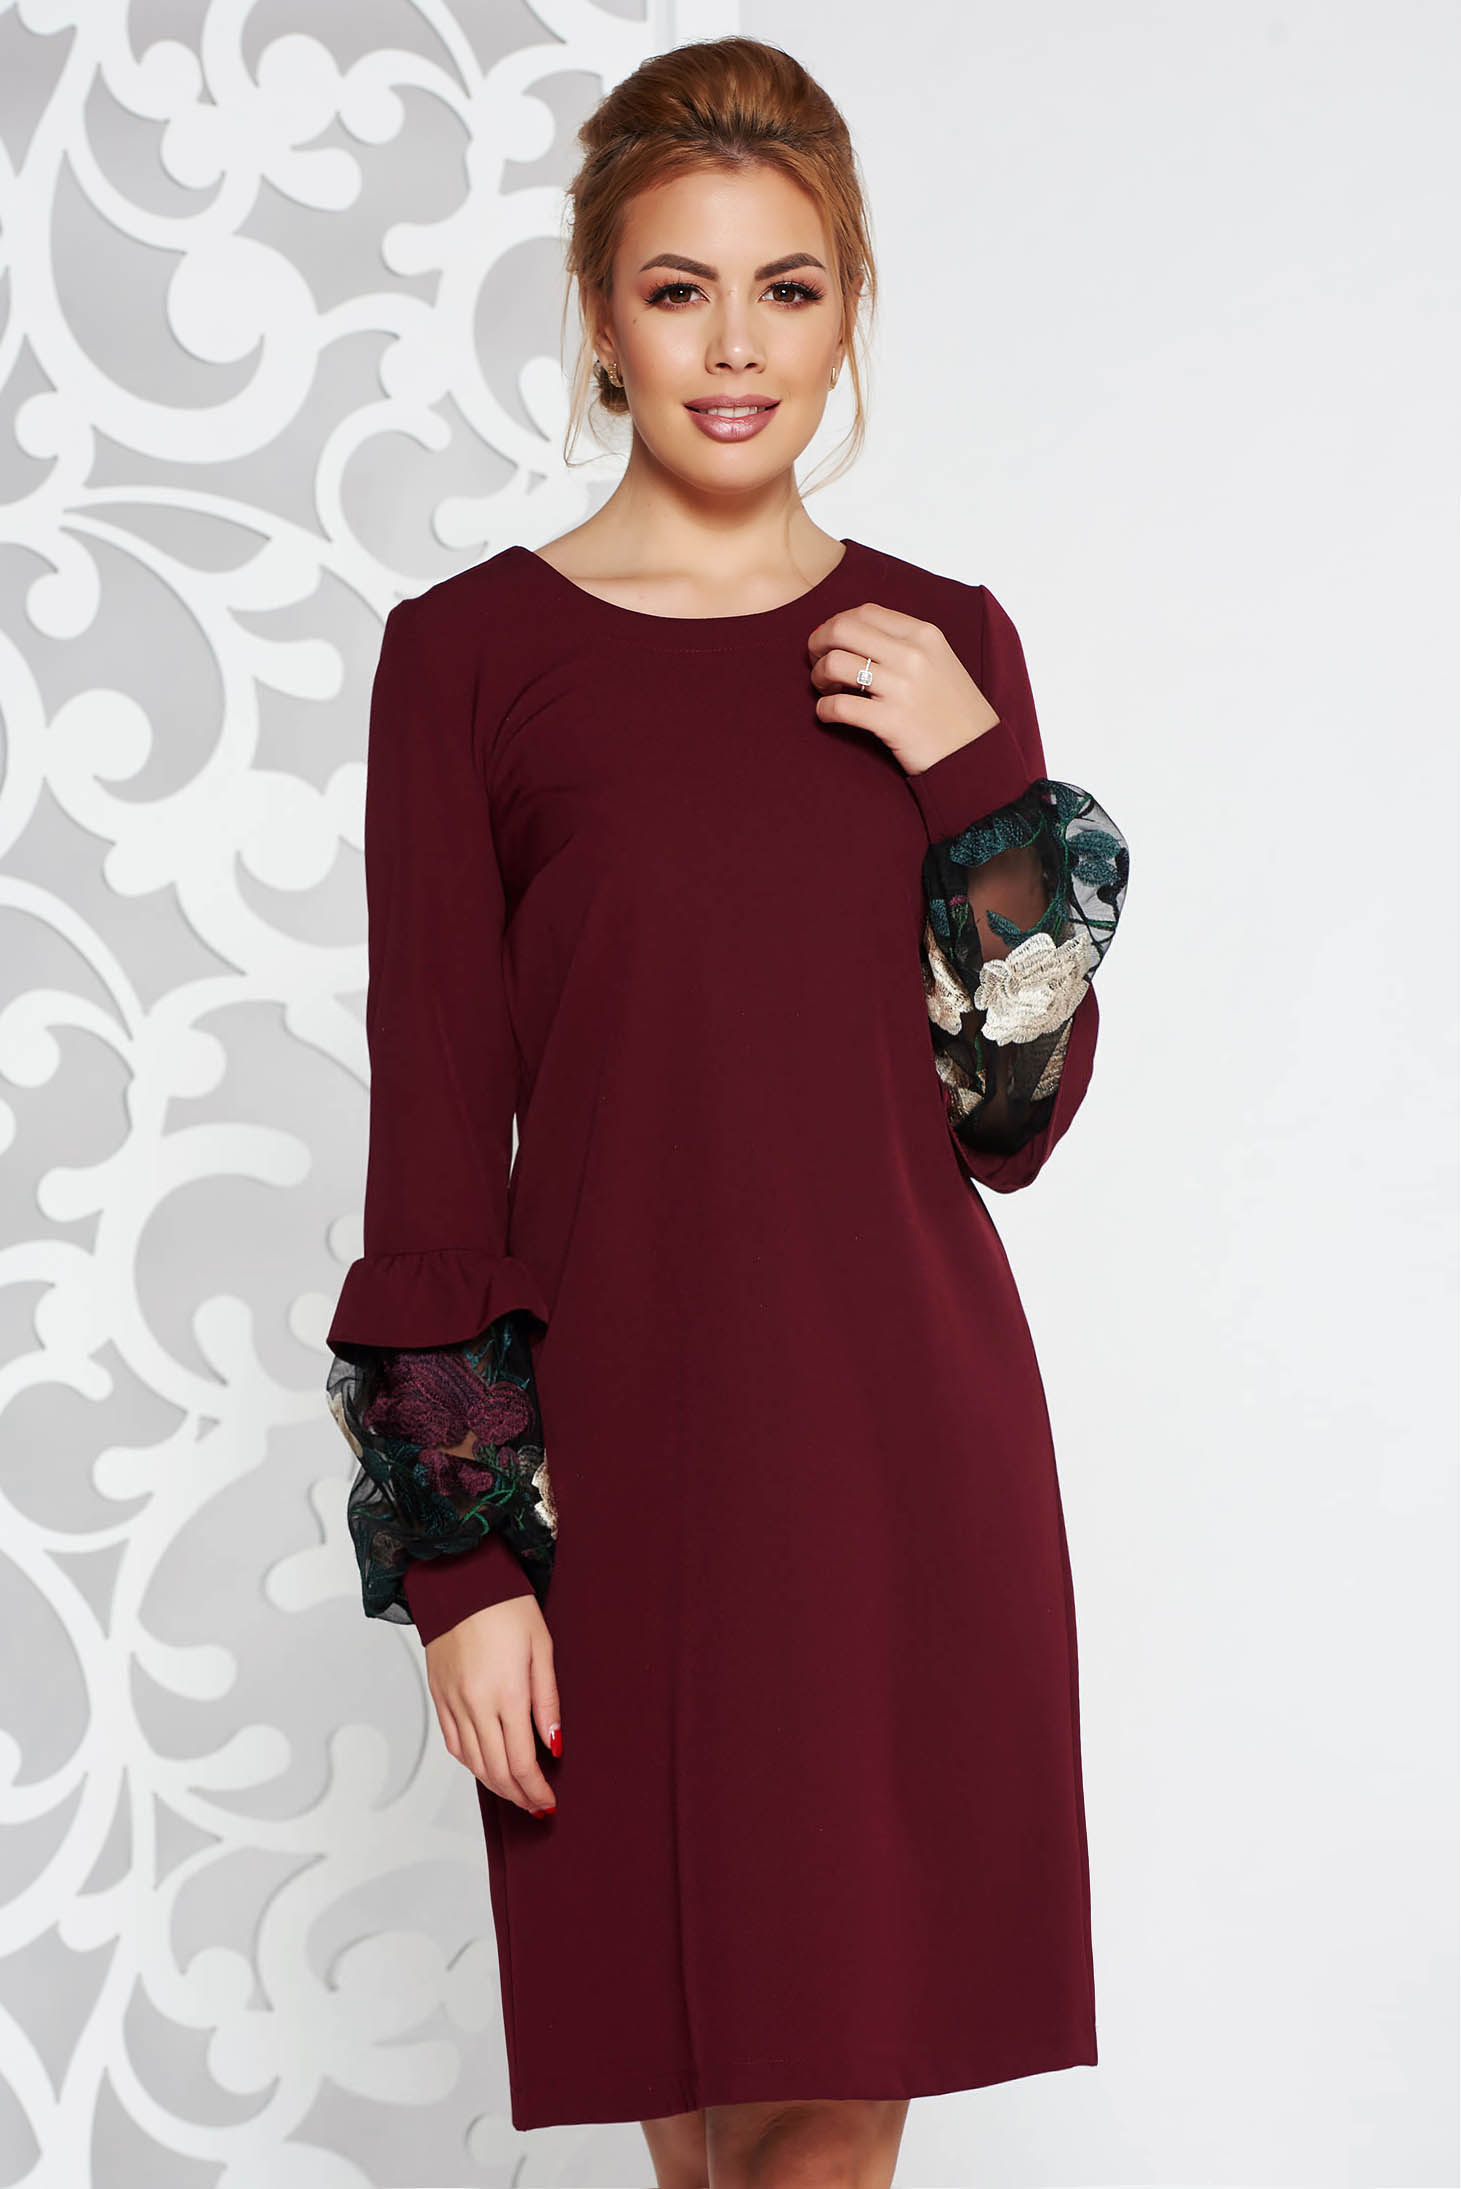 Rochie StarShinerS visinie eleganta cu croi larg din stofa usor elastica cu aplicatii de dantela